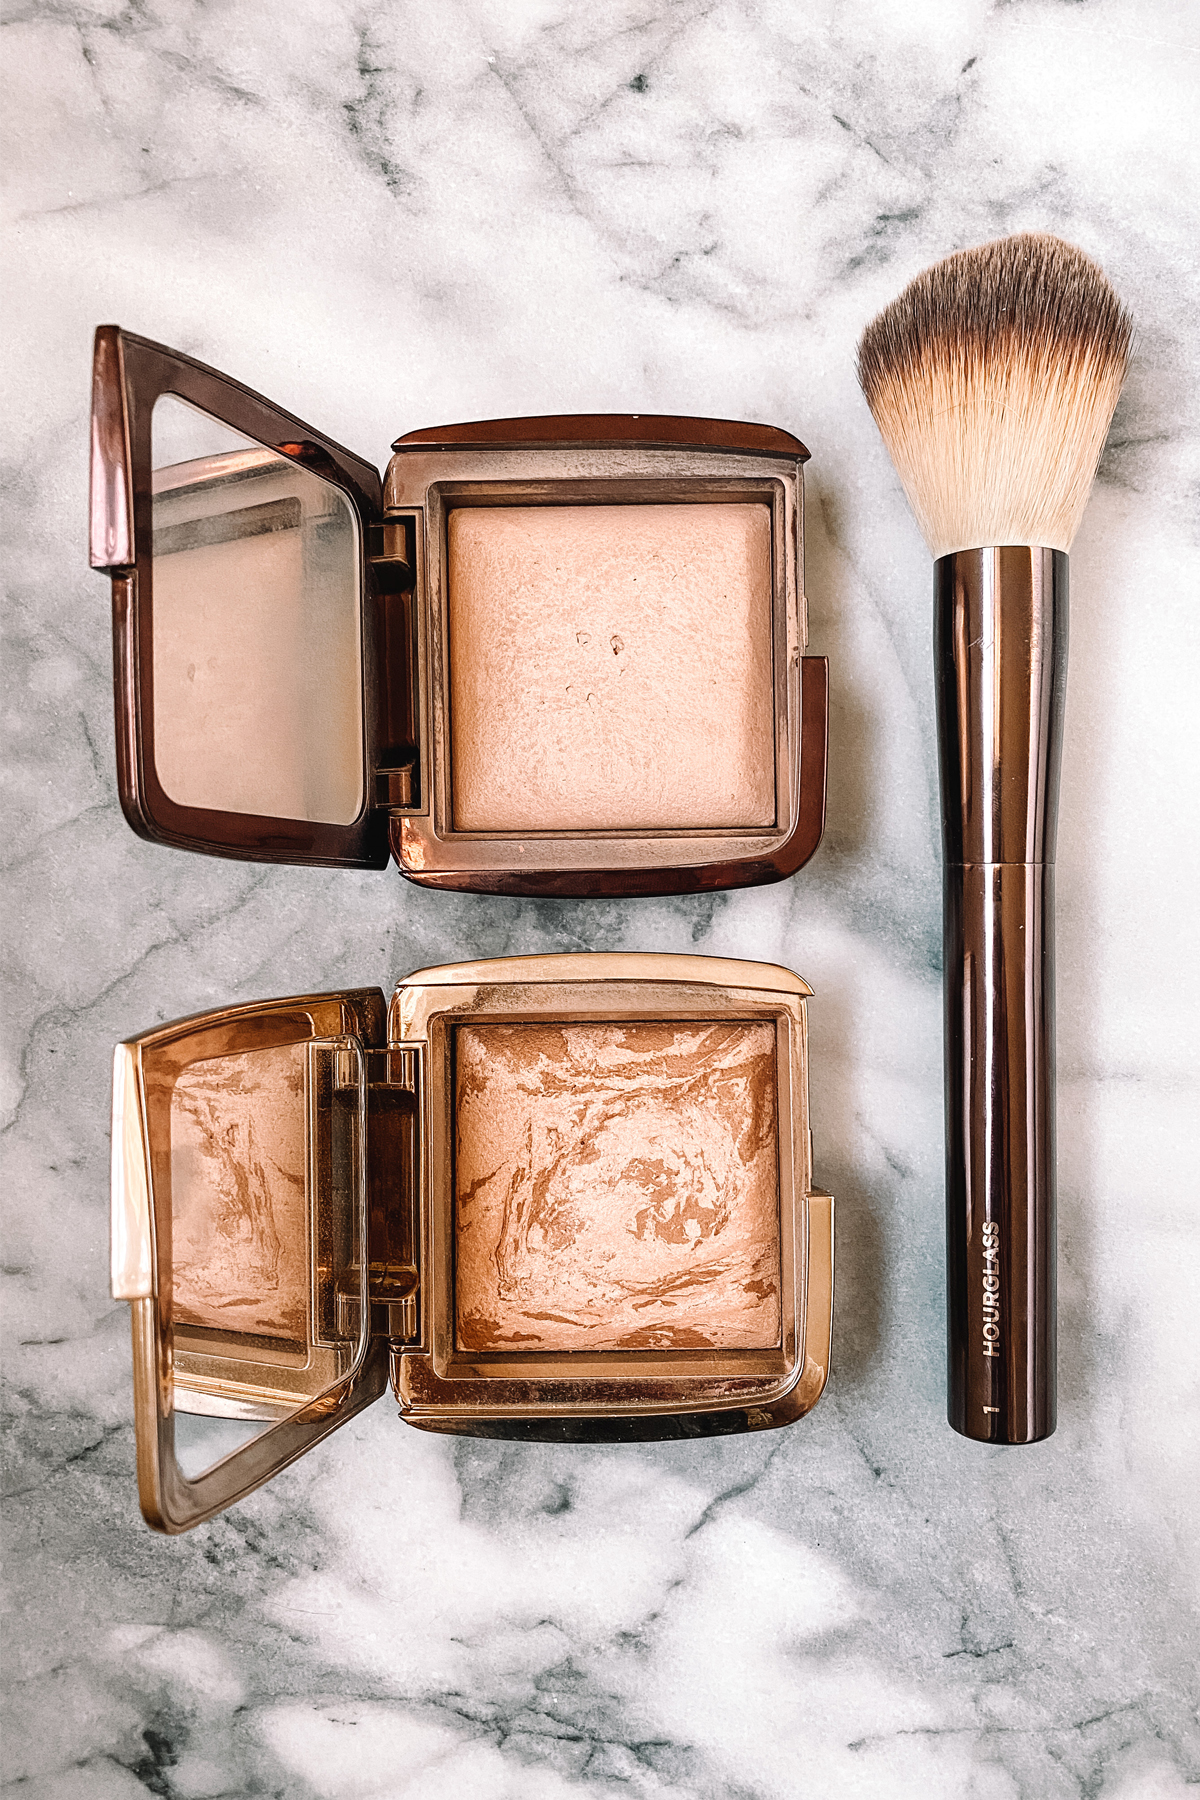 Fashion Jackson Sephora Hourglass Powder Hourglass Bronzer Hourglass Powder Brush